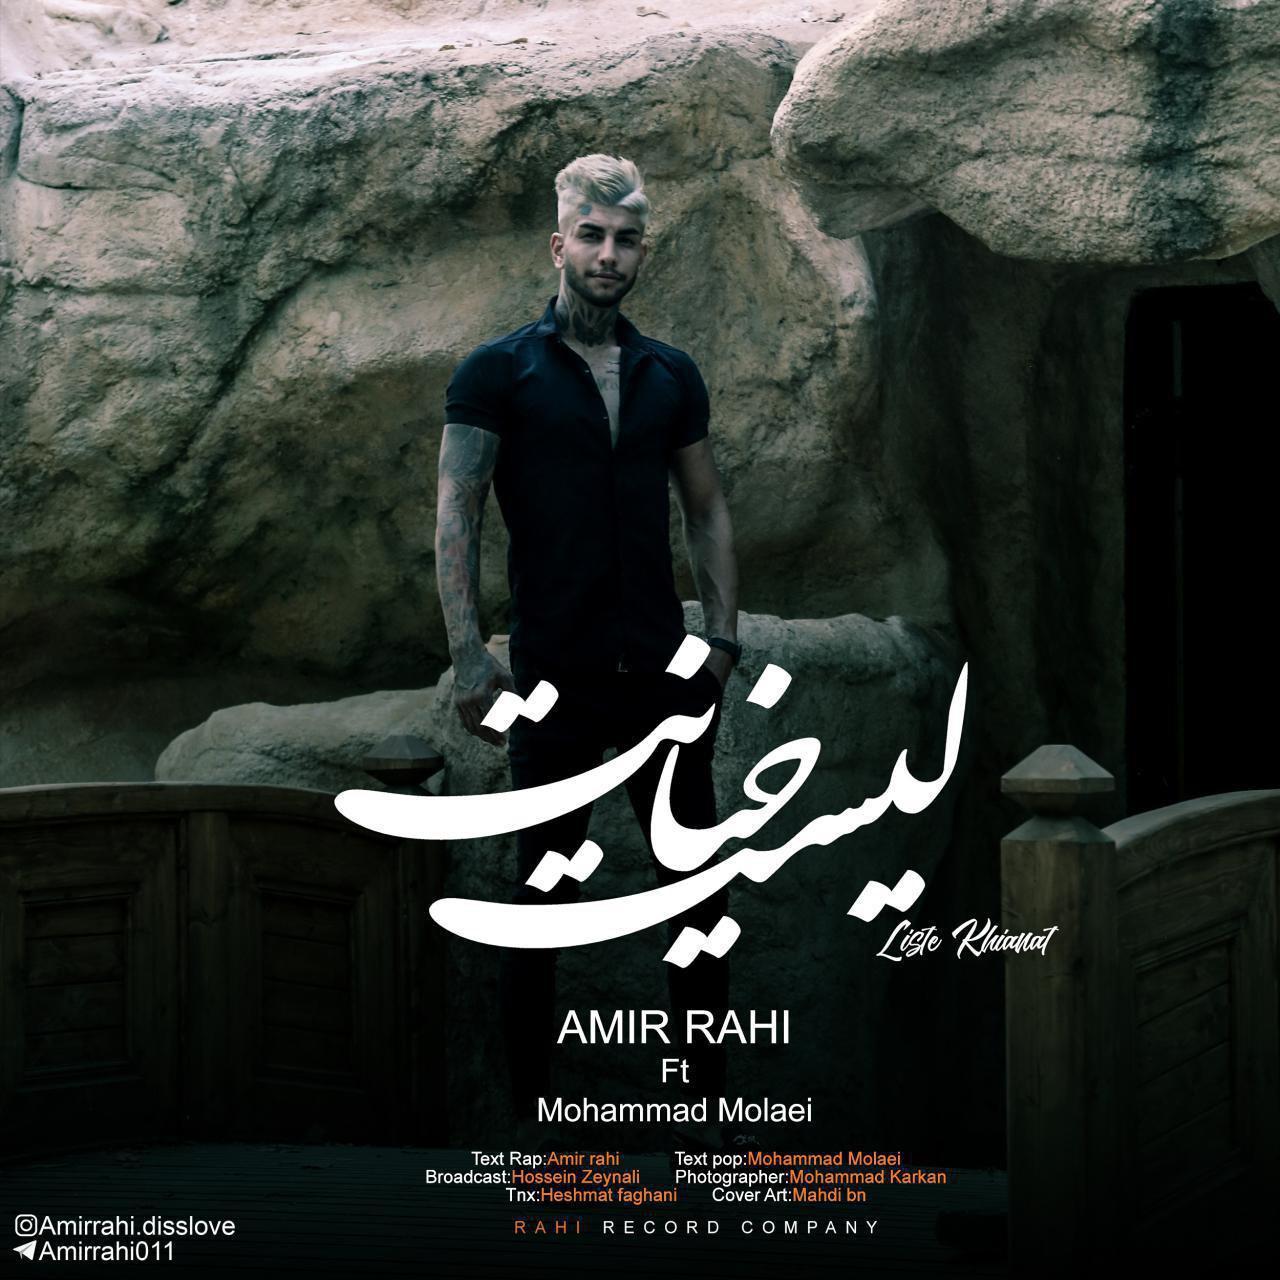 Amir Rahi – List Khianat (Ft Mohammad Molaei)